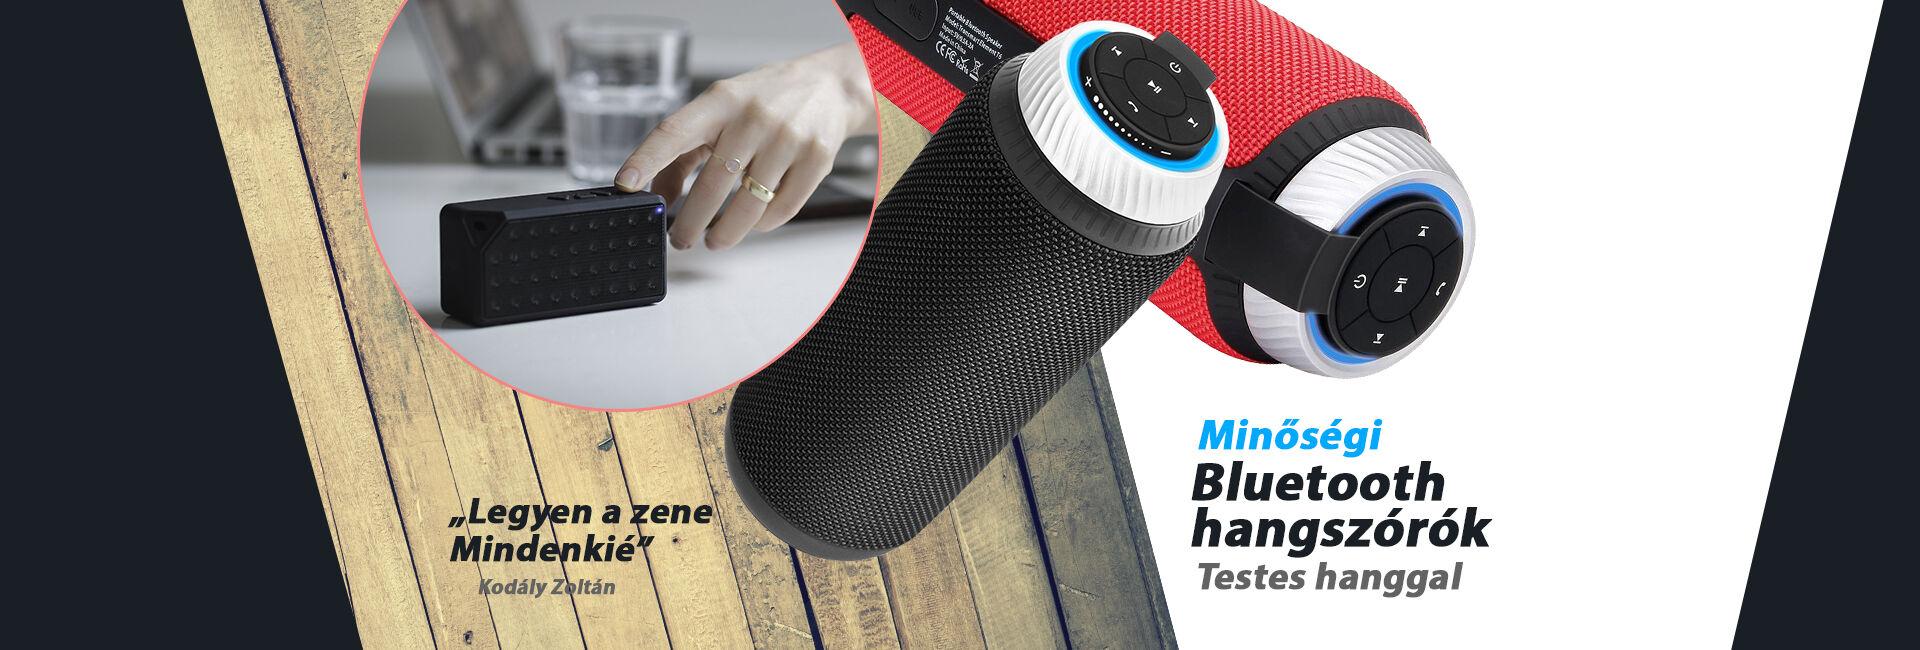 Bluetooth hangsz